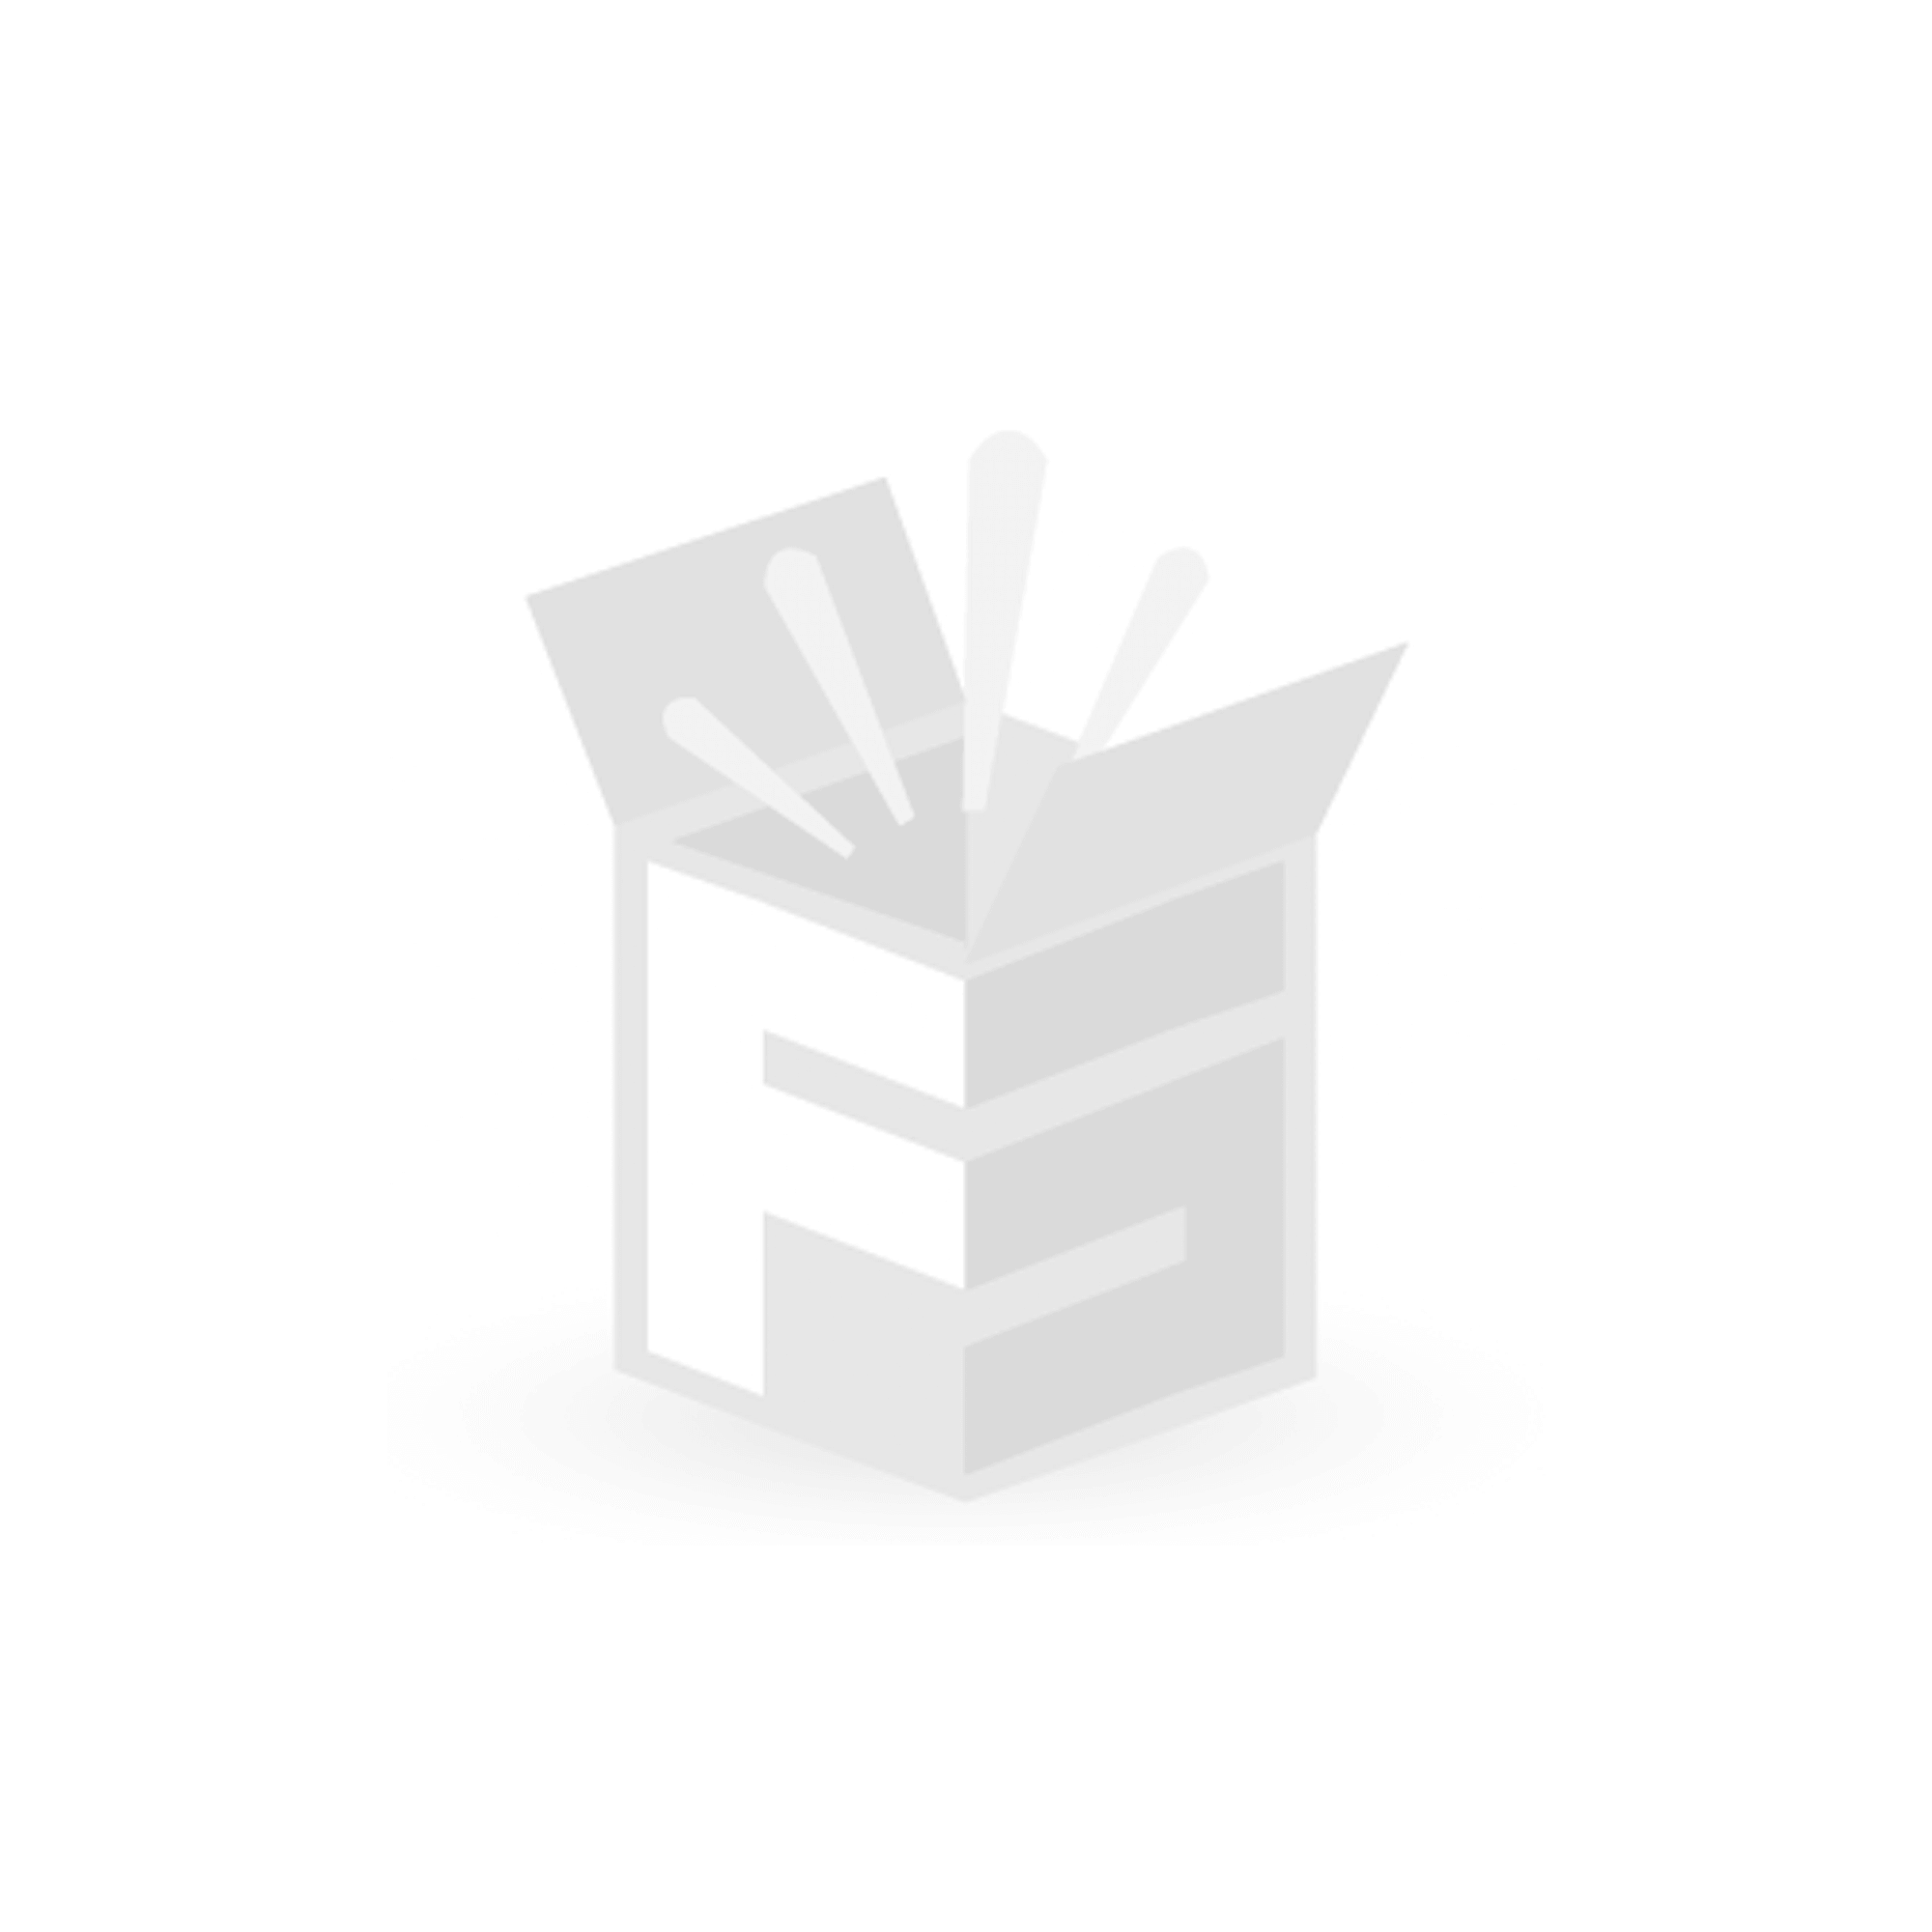 FS-STAR Weihnachtskugel LED blau / silber, 10 Stück